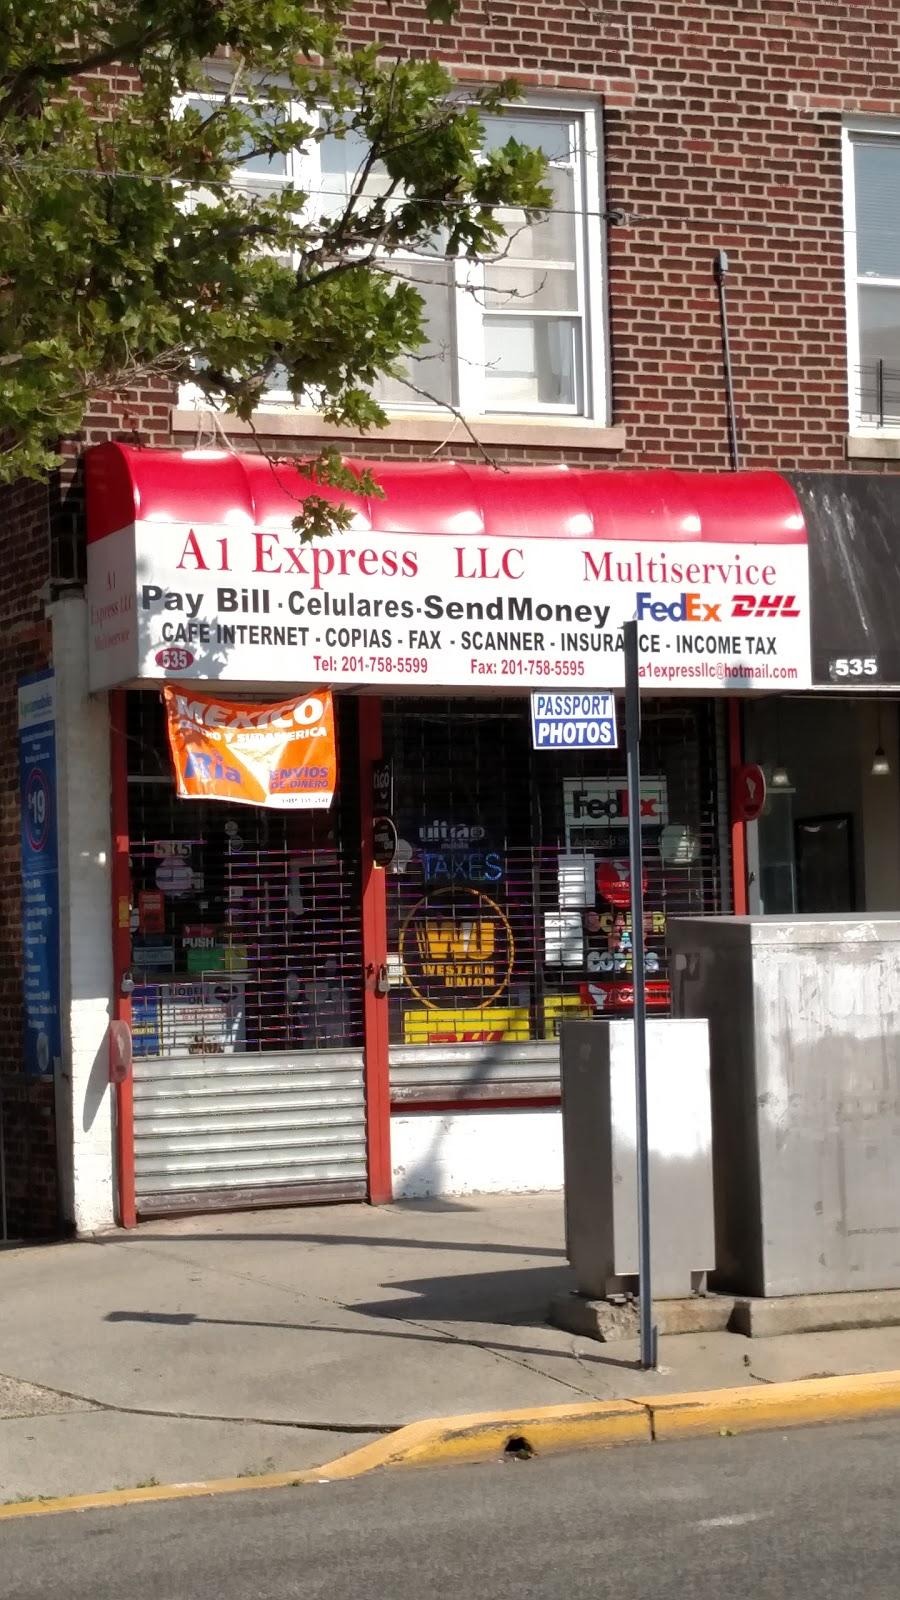 A1EXPRESSllC MUlTiSerVice | insurance agency | 535 John F. Kennedy Blvd, North Bergen, NJ 07047, USA | 2016816201 OR +1 201-681-6201